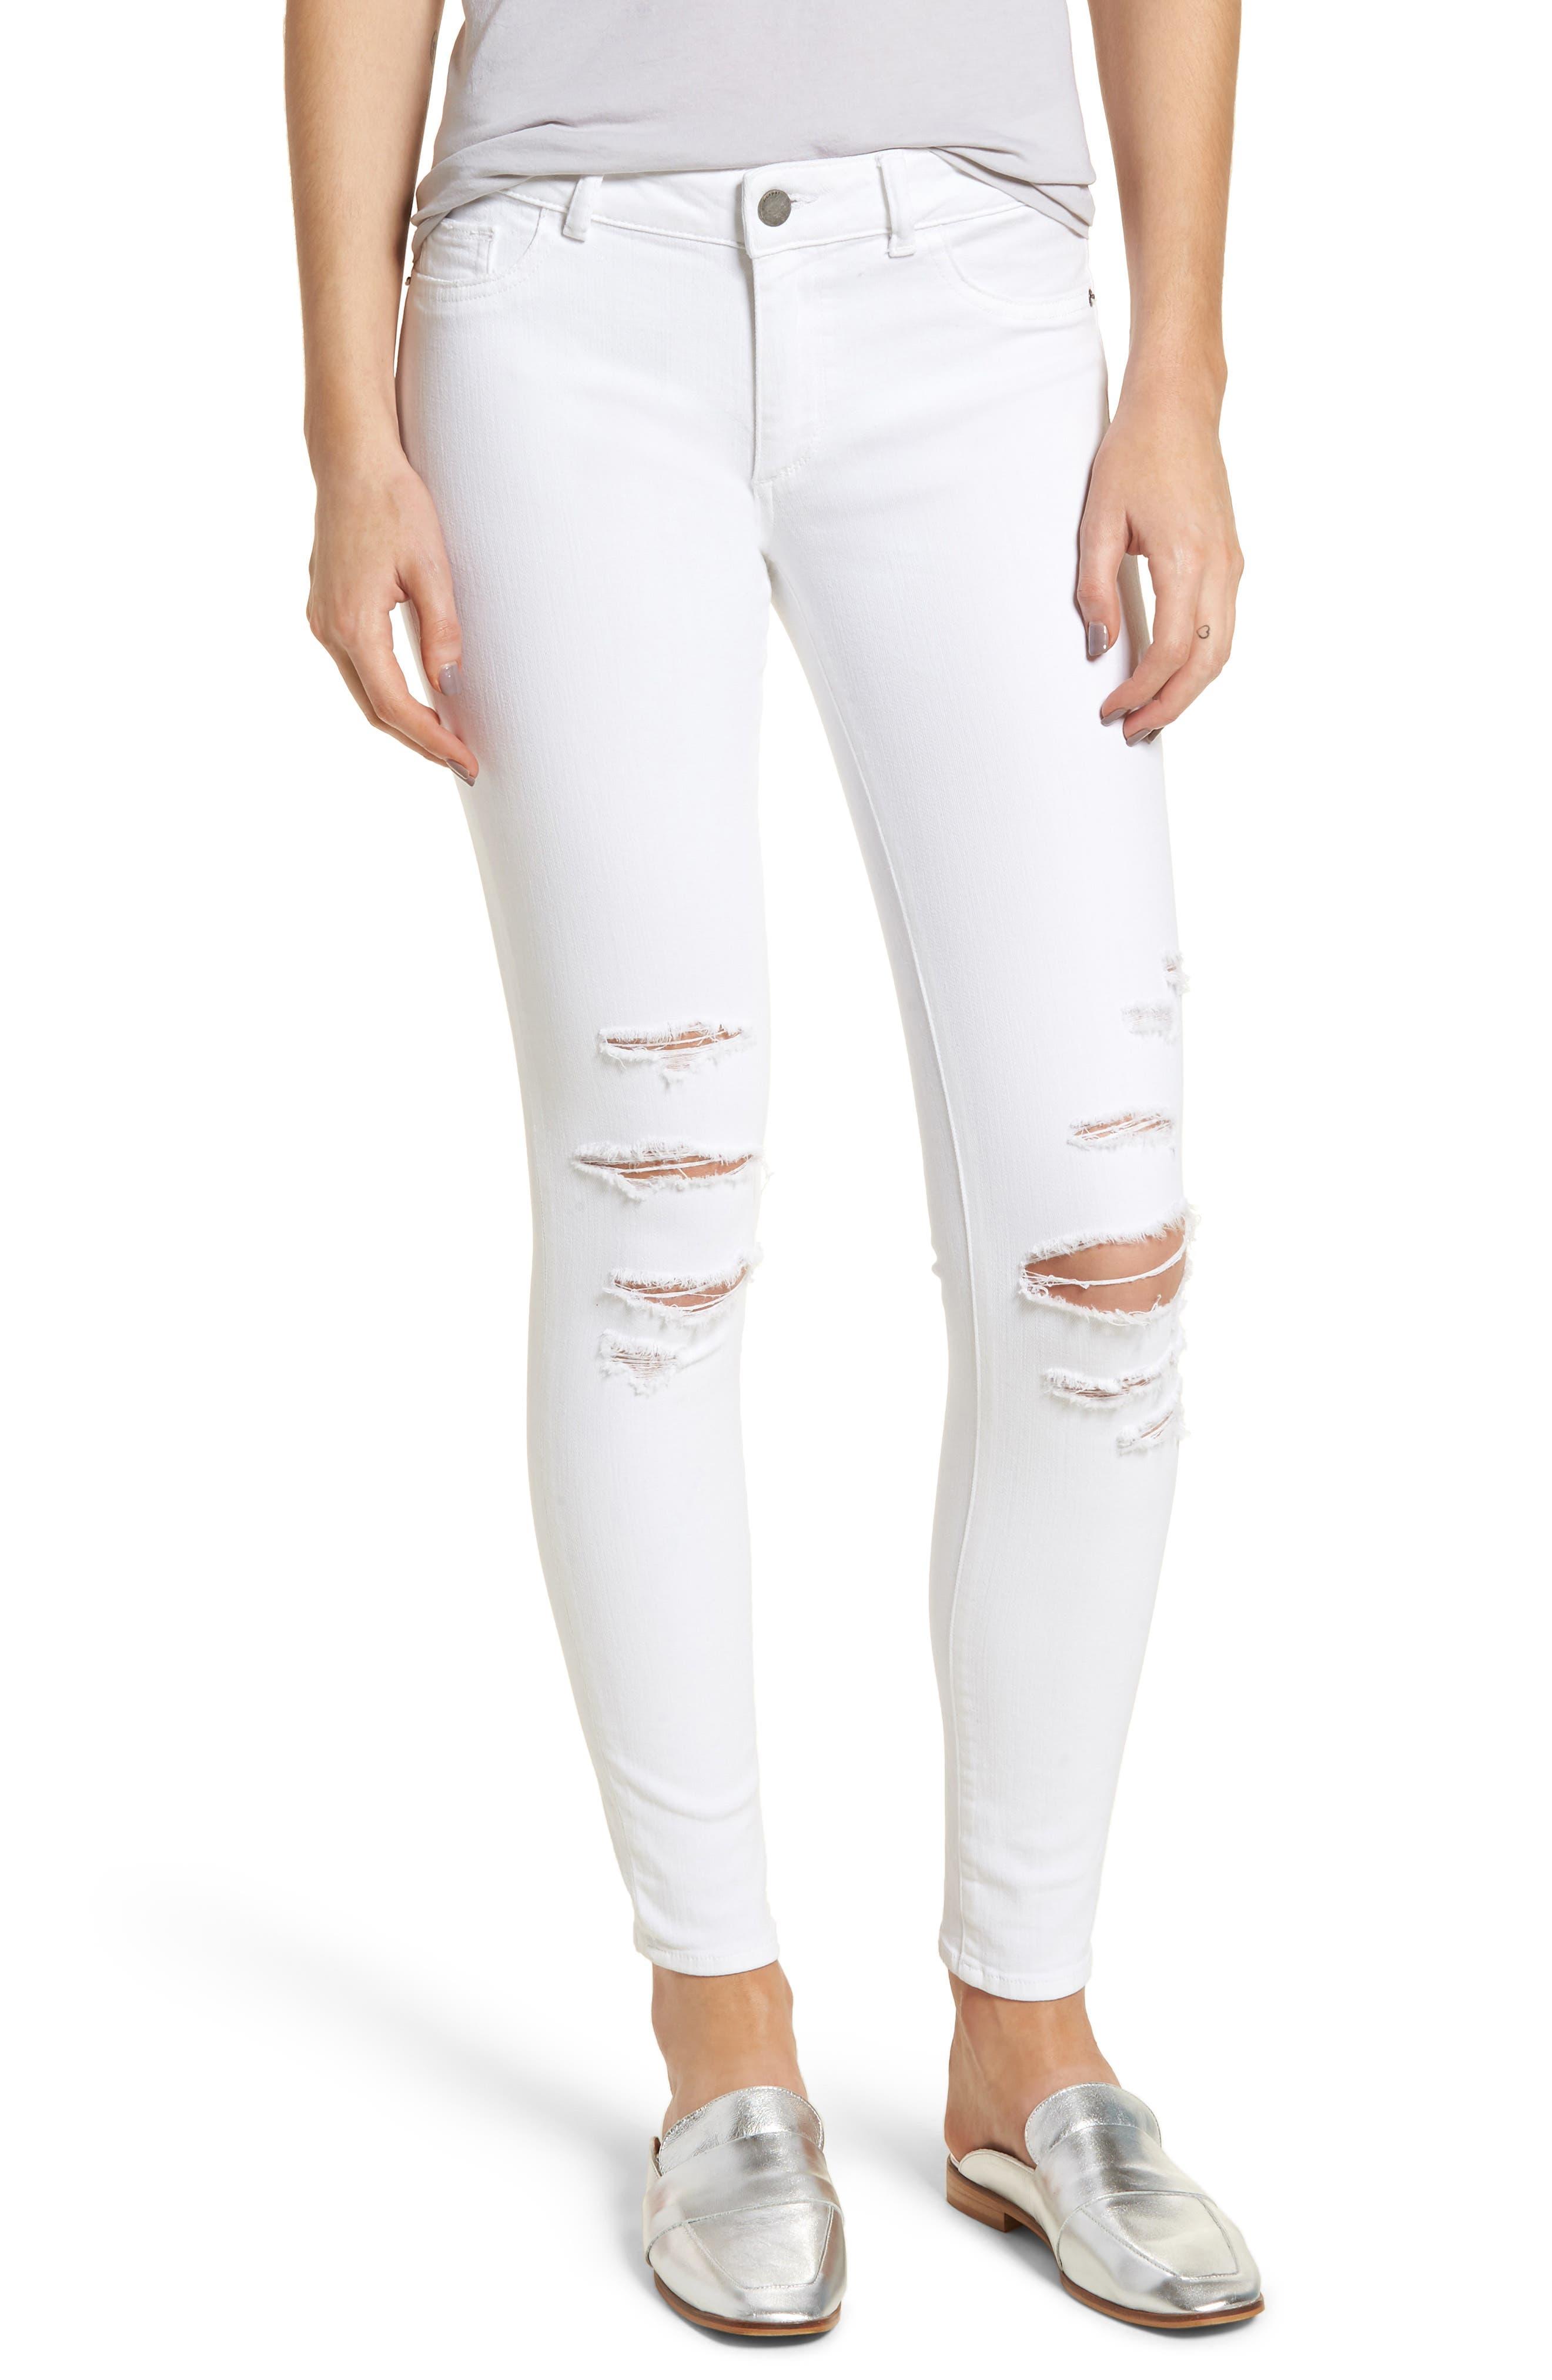 Emma Power Legging Jeans,                             Main thumbnail 1, color,                             100